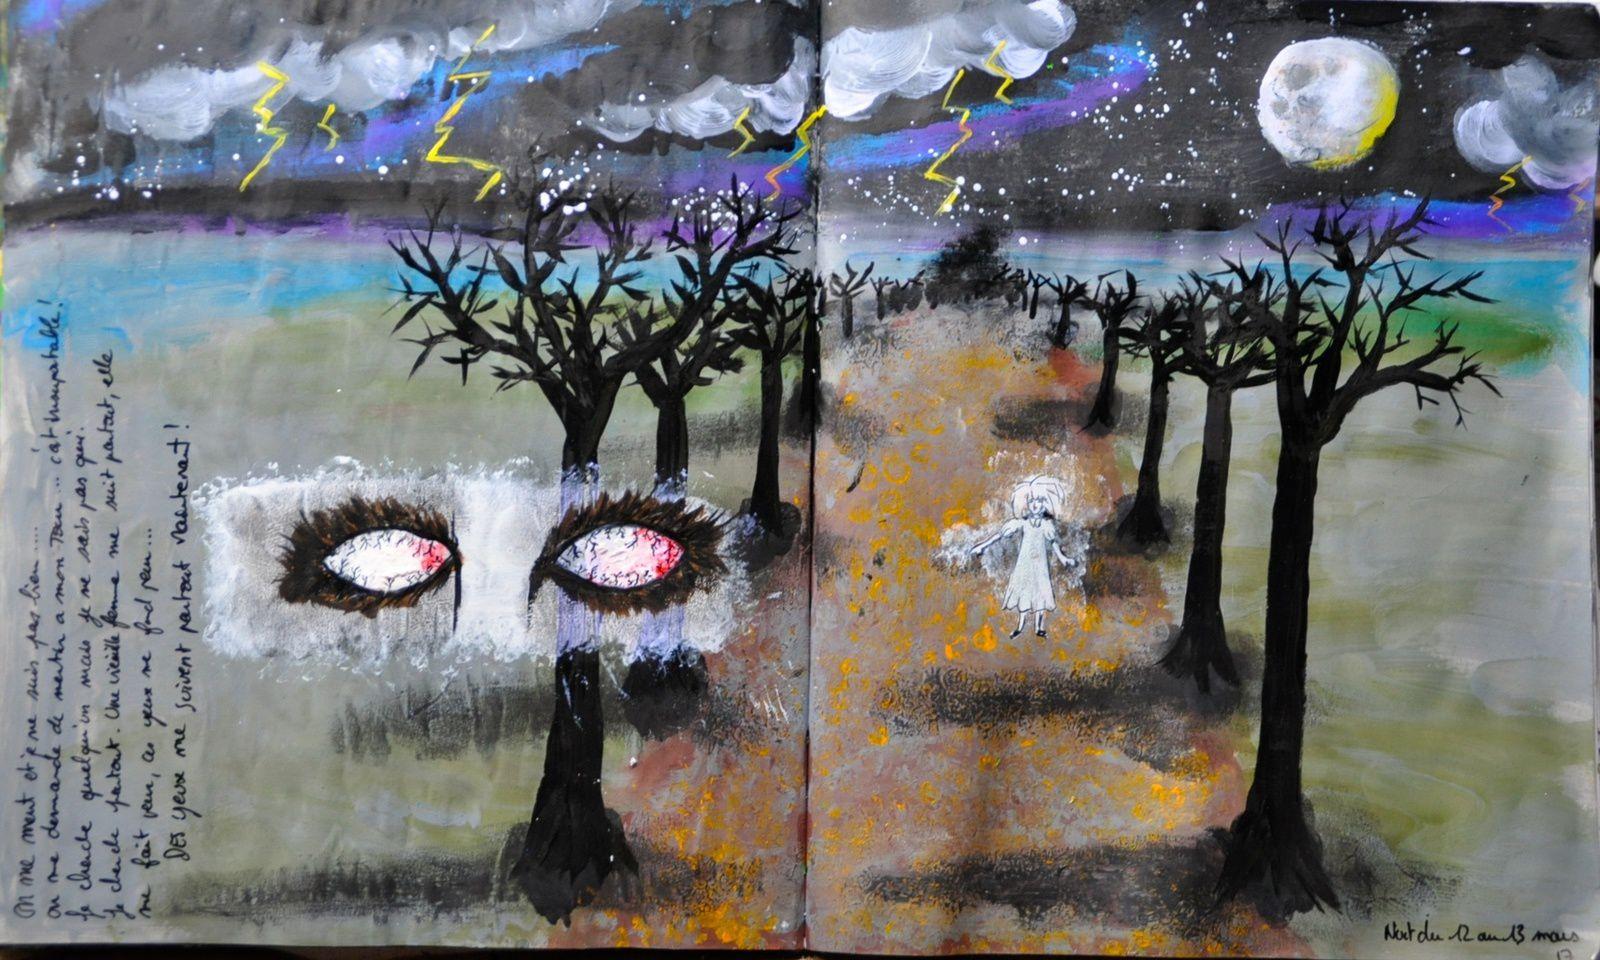 Rêves et Cauchemars #7